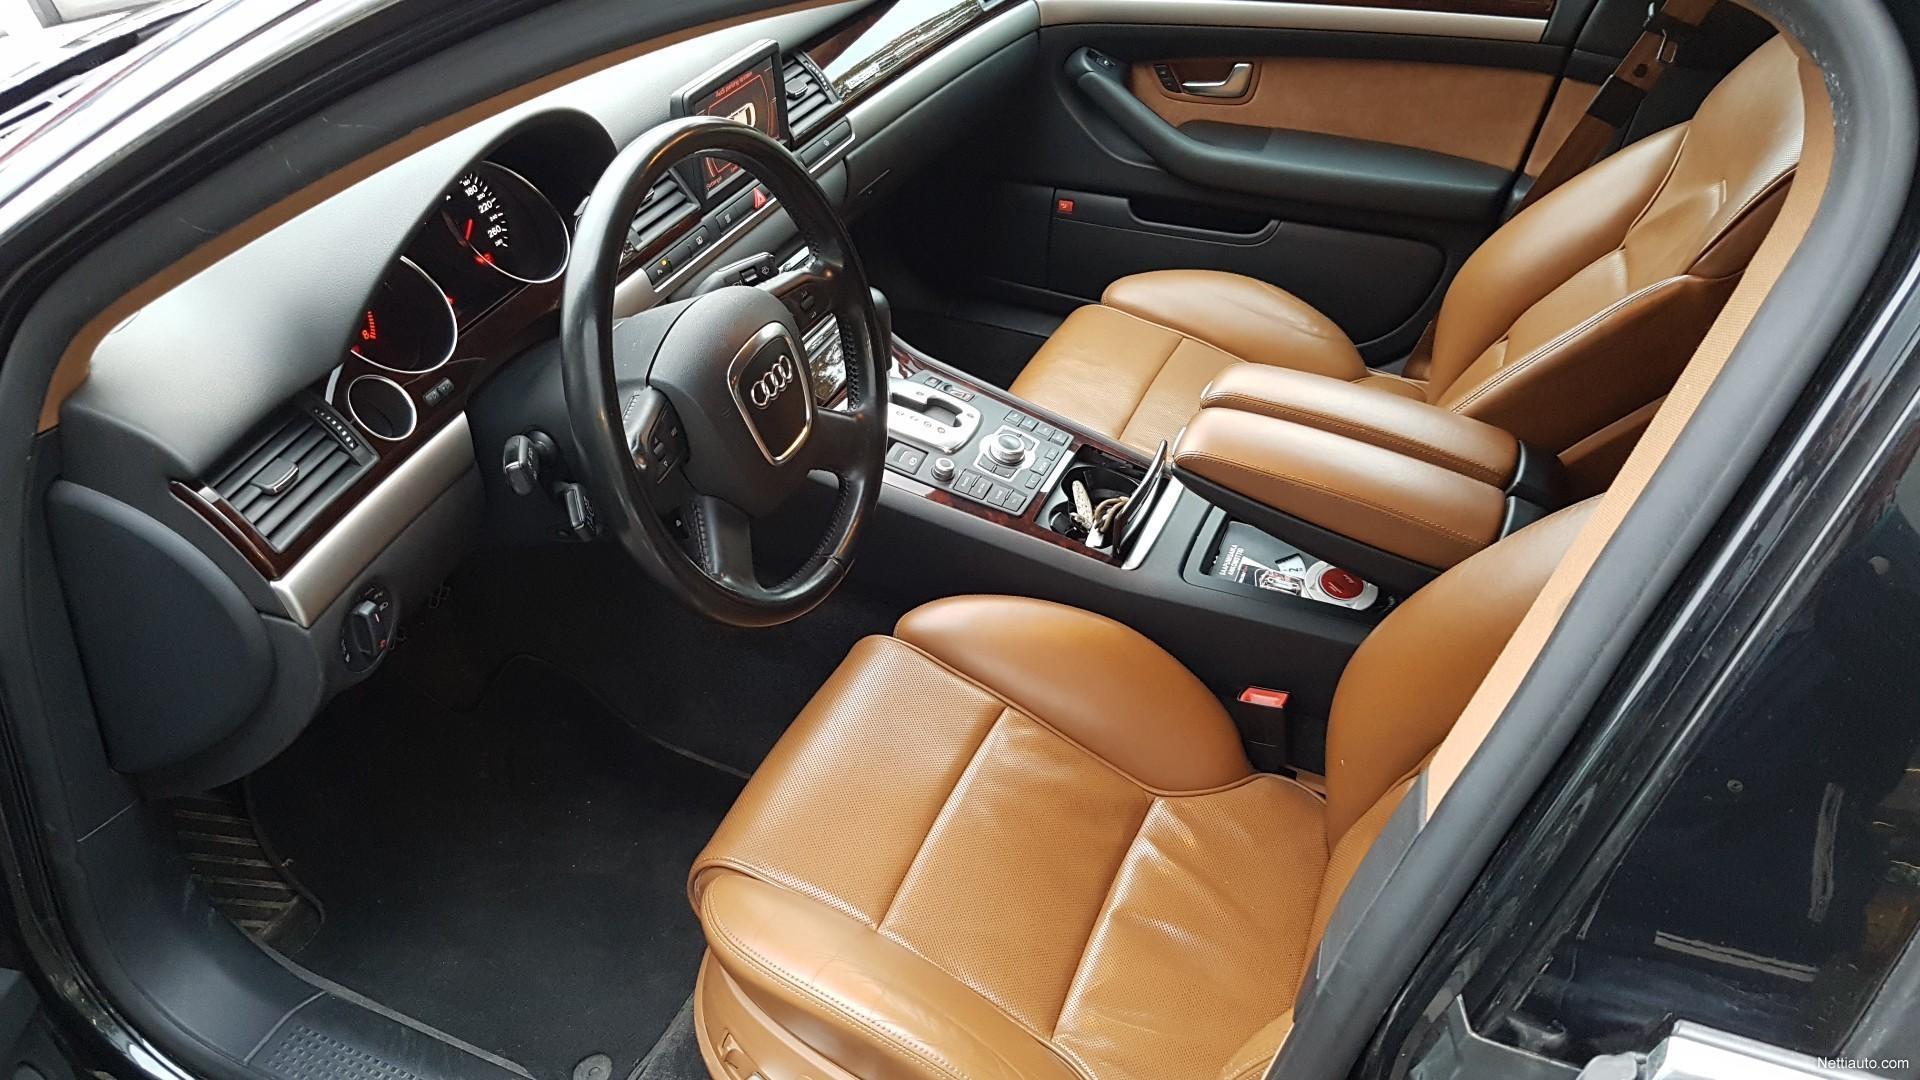 Audi A8 4 2 V8 257kw quattro 4d Tiptronic Sedan 2007 Used